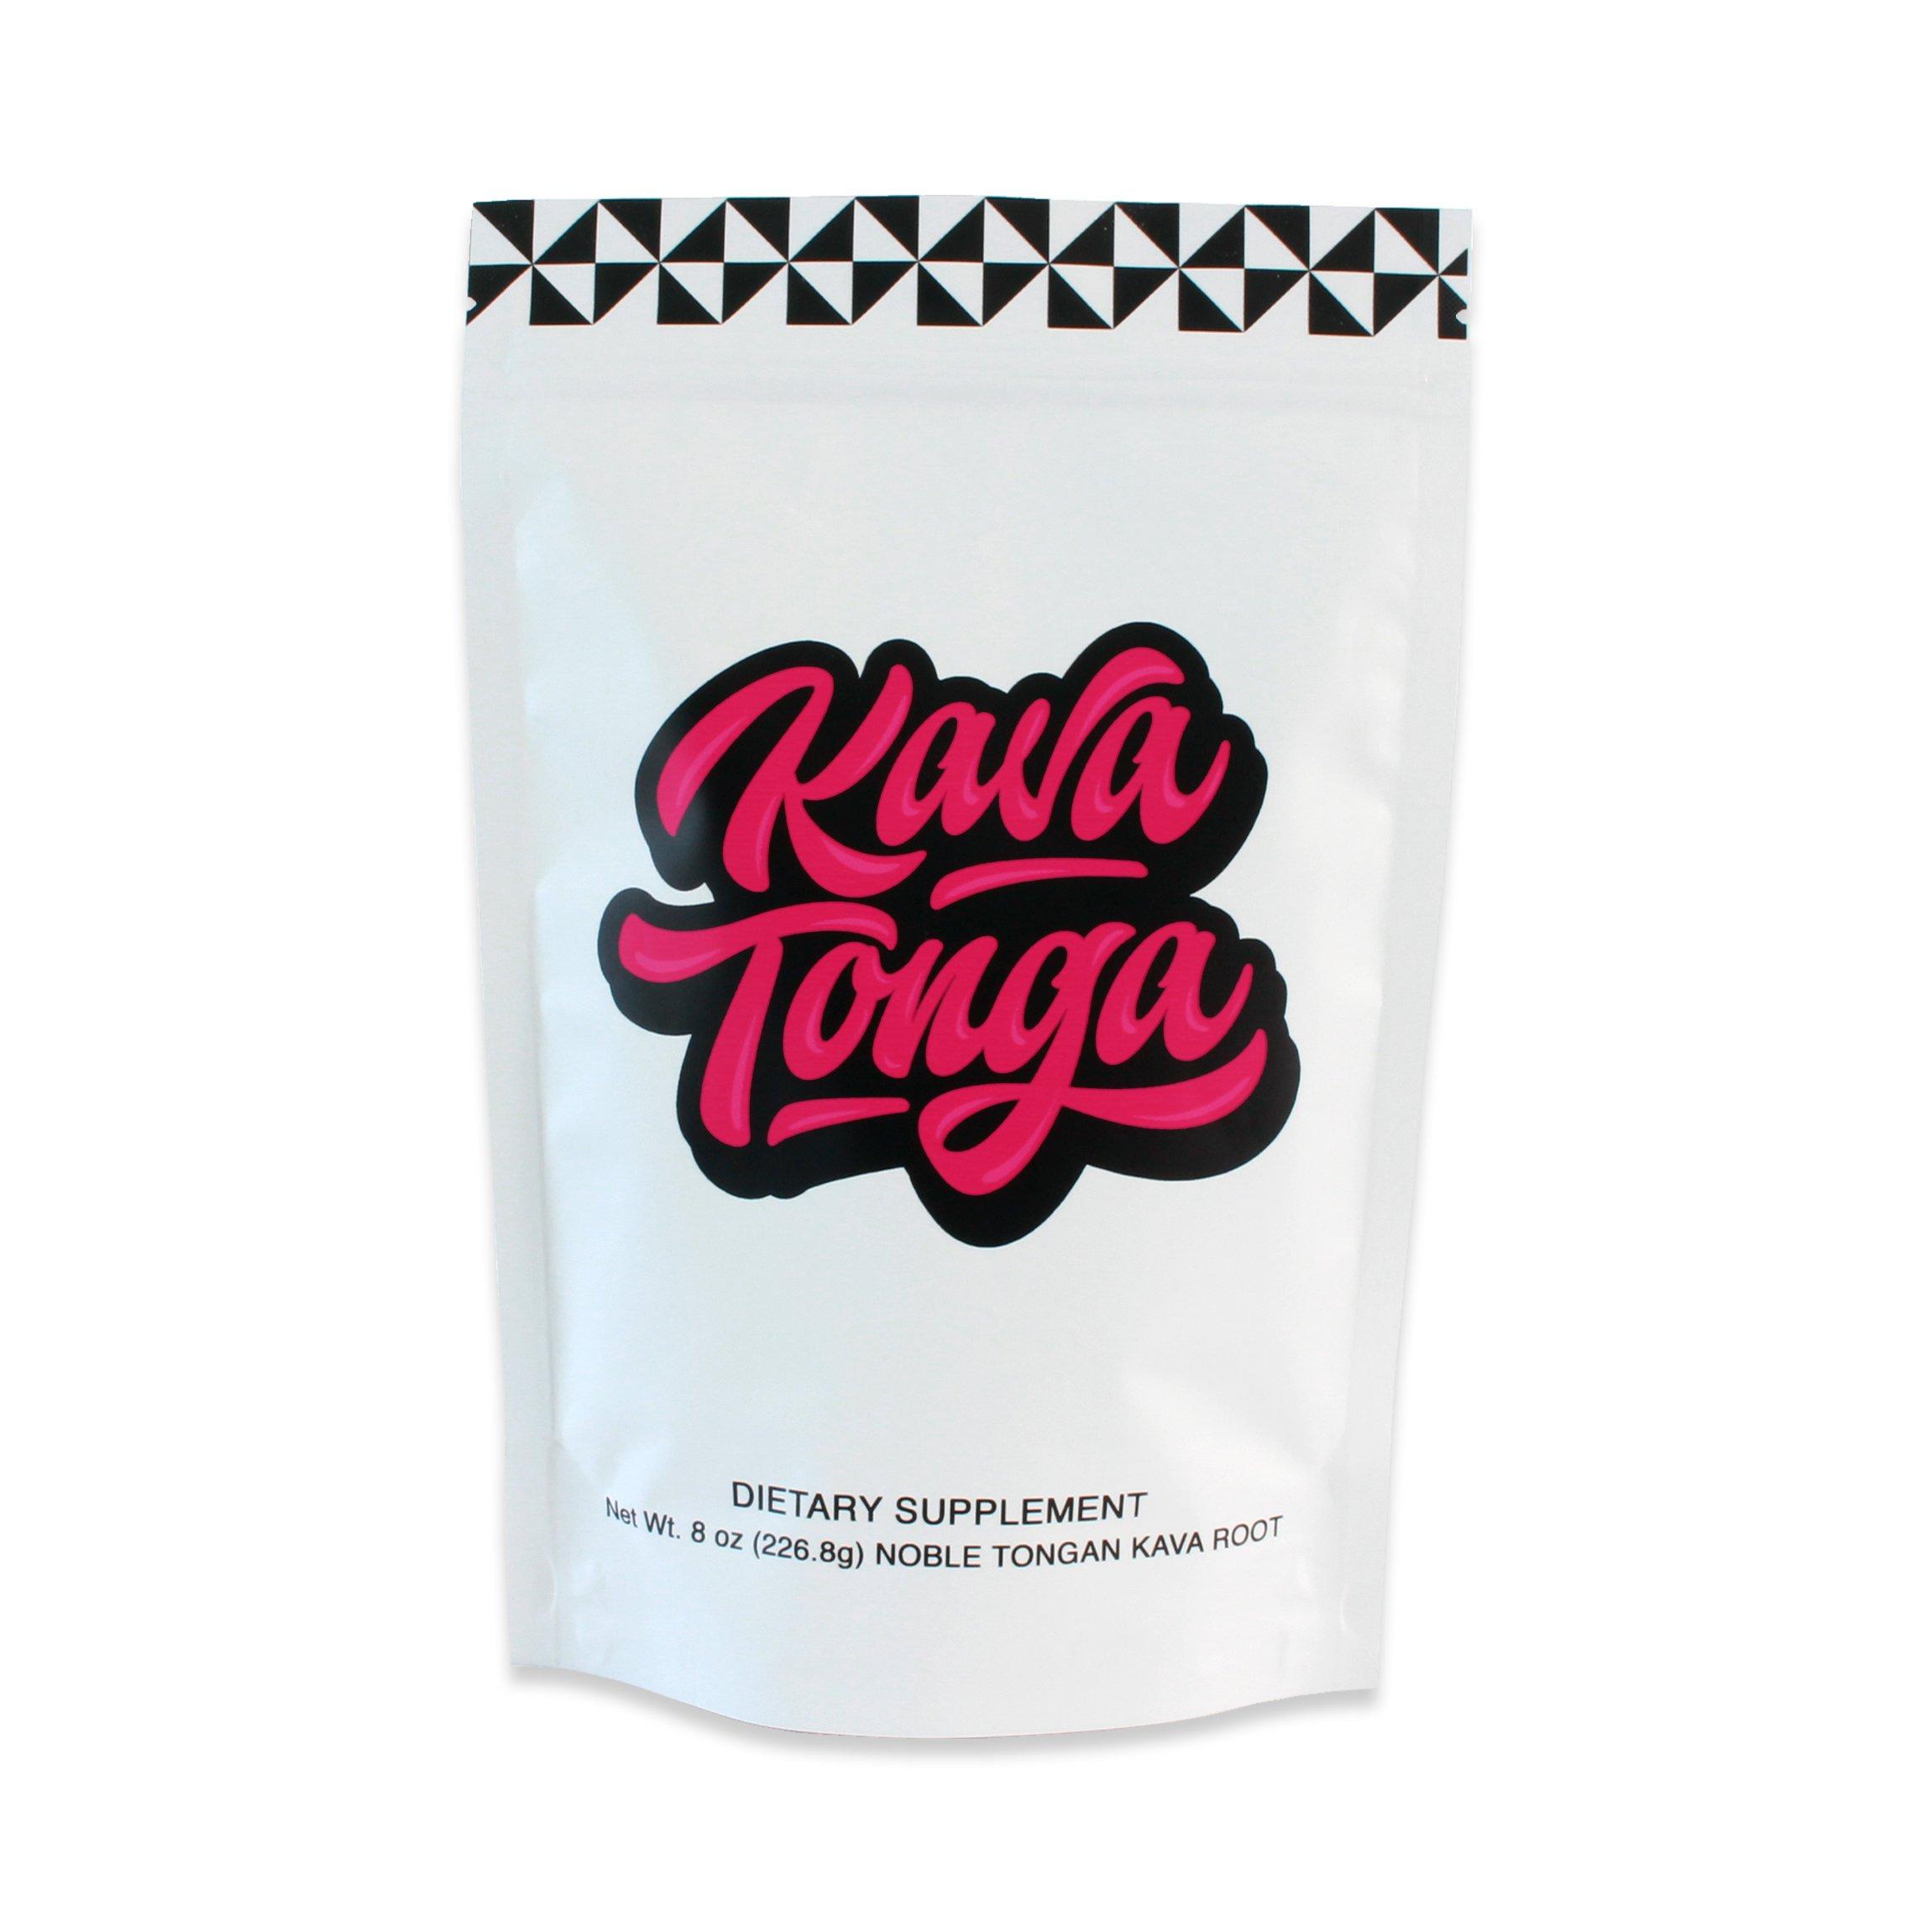 Kavafied KAVA Tonga - Premium Tongan Kava Root Powder (8oz)